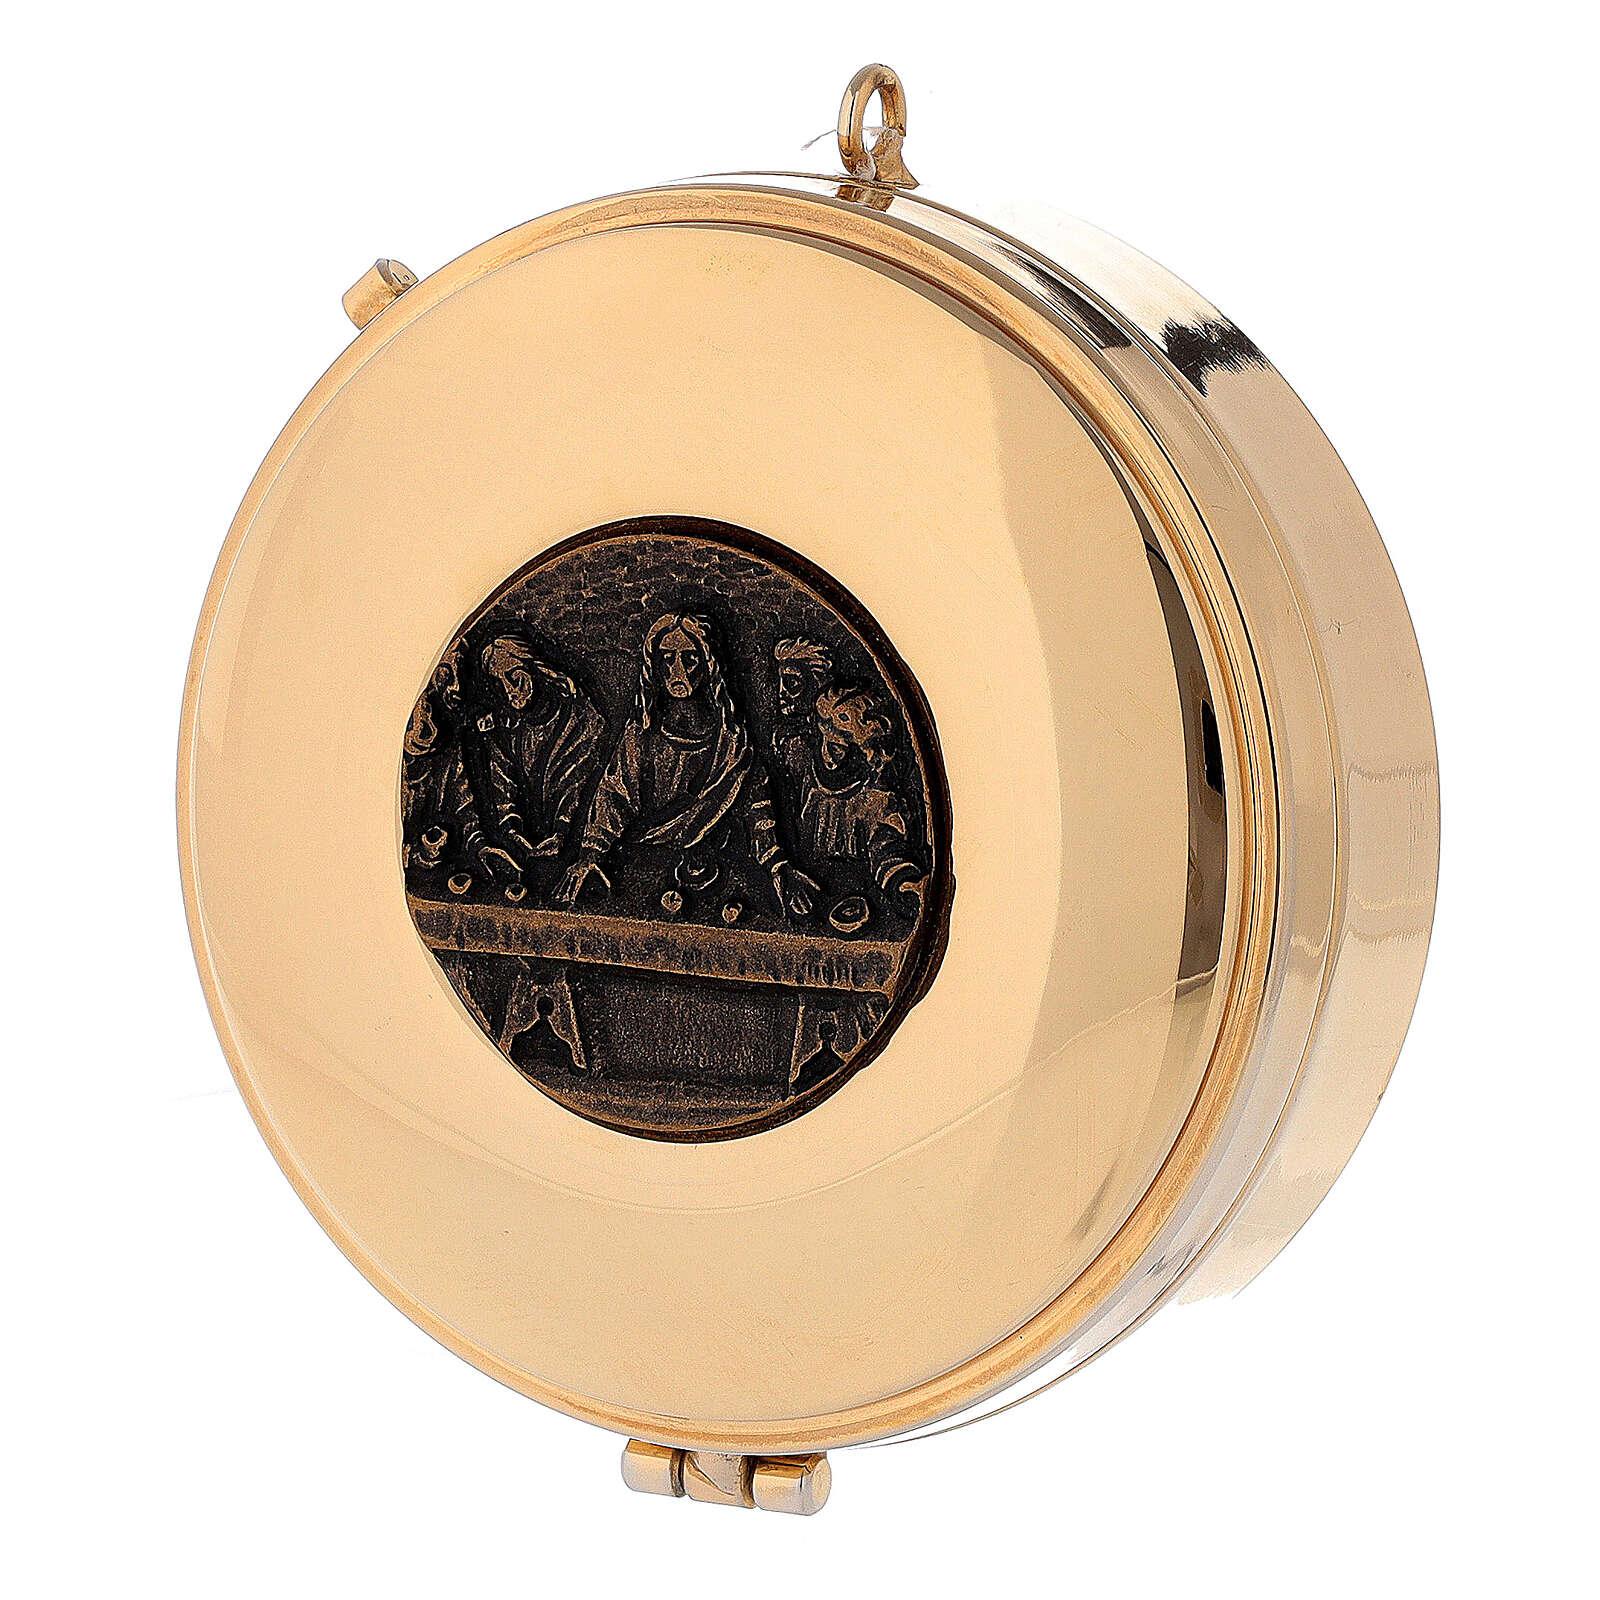 Teca Eucaristica Ultima Cena placca bronzo antico 3x10 cm 3